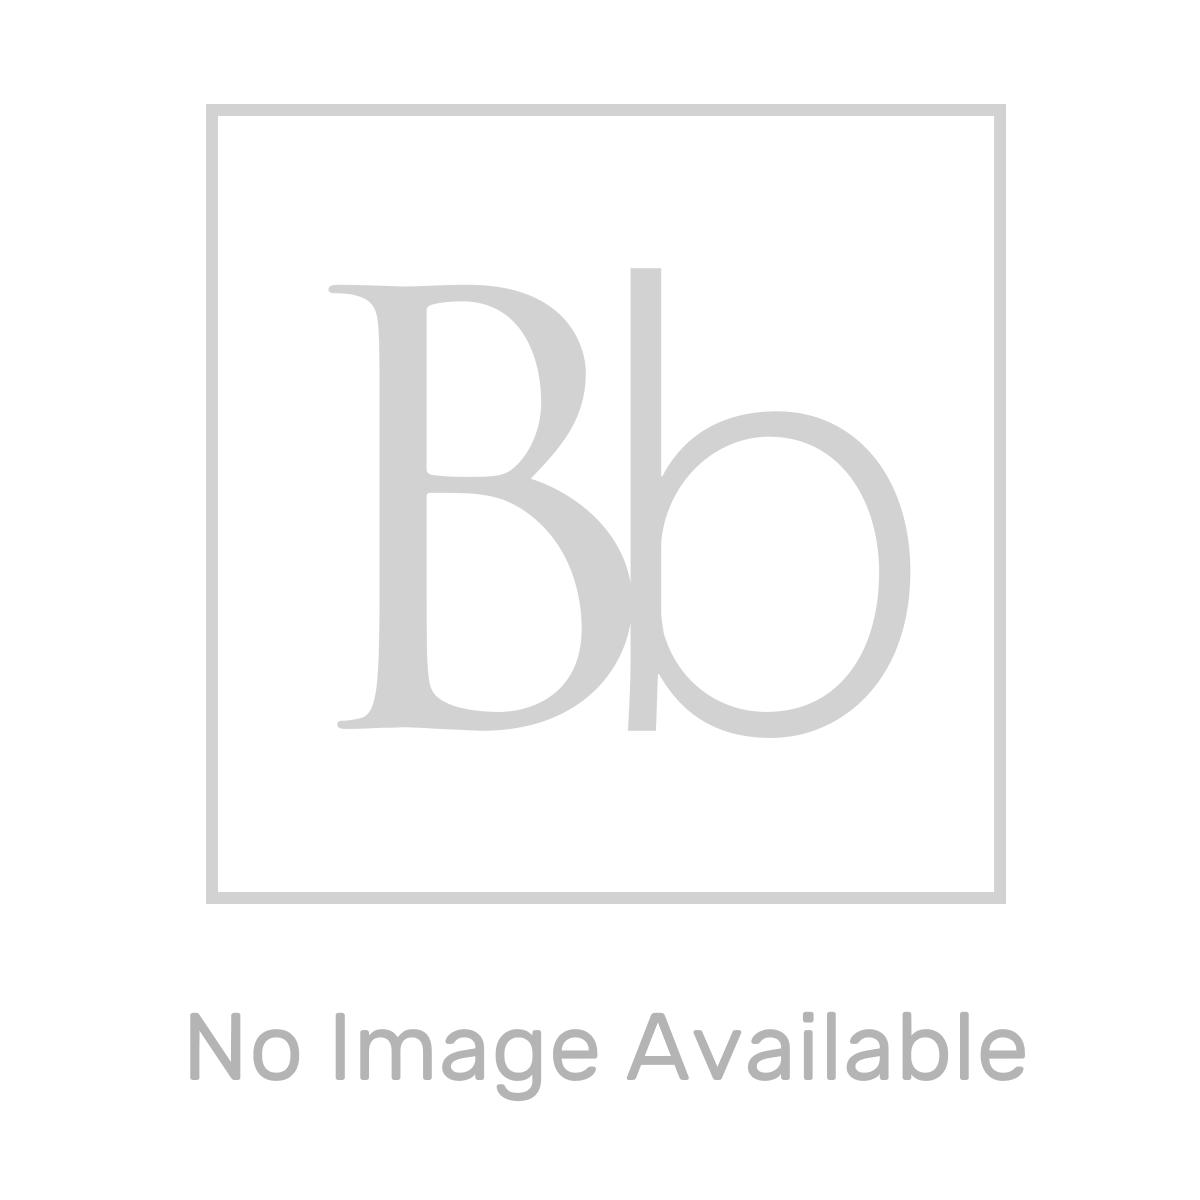 RAK Feeling Cappuccino Rectangular Shower Tray 1200 x 800mm Measurements